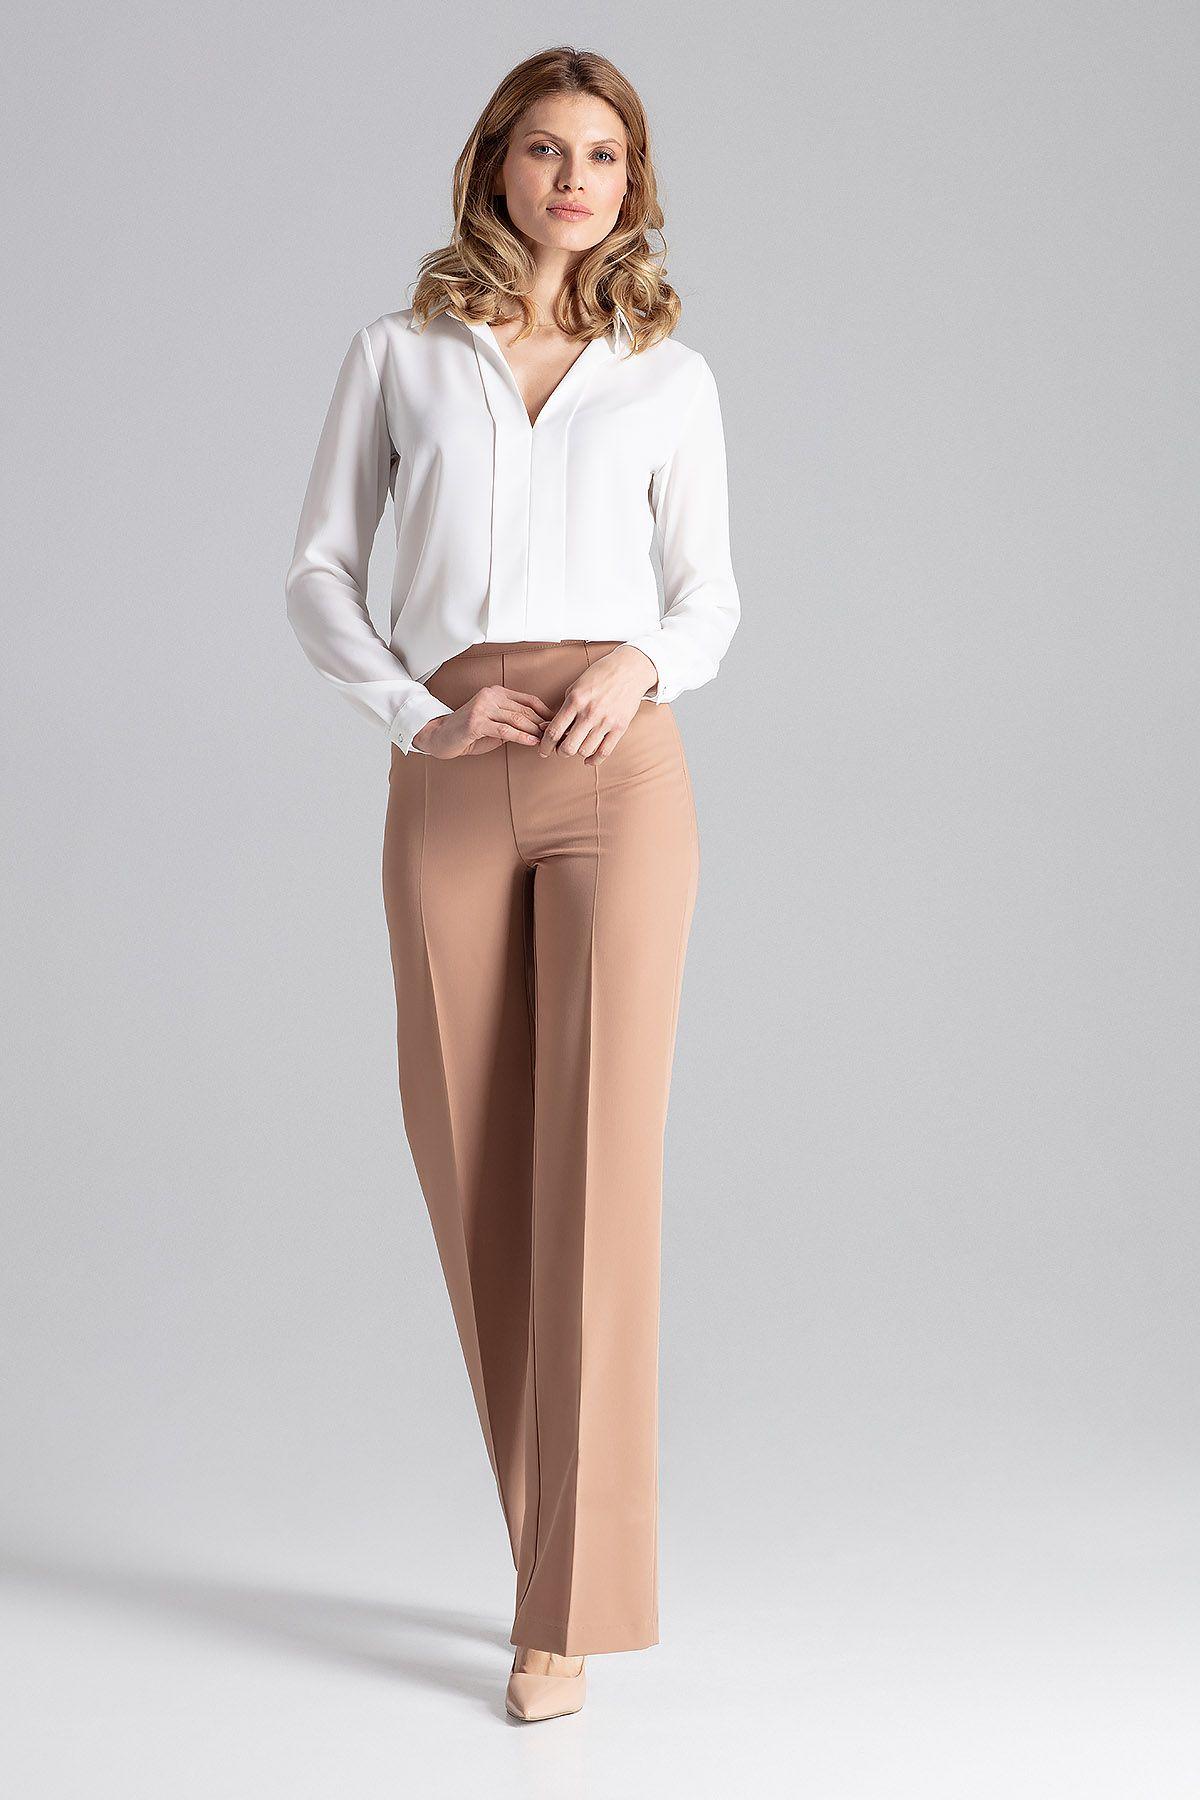 Brown Long Dress Trousers